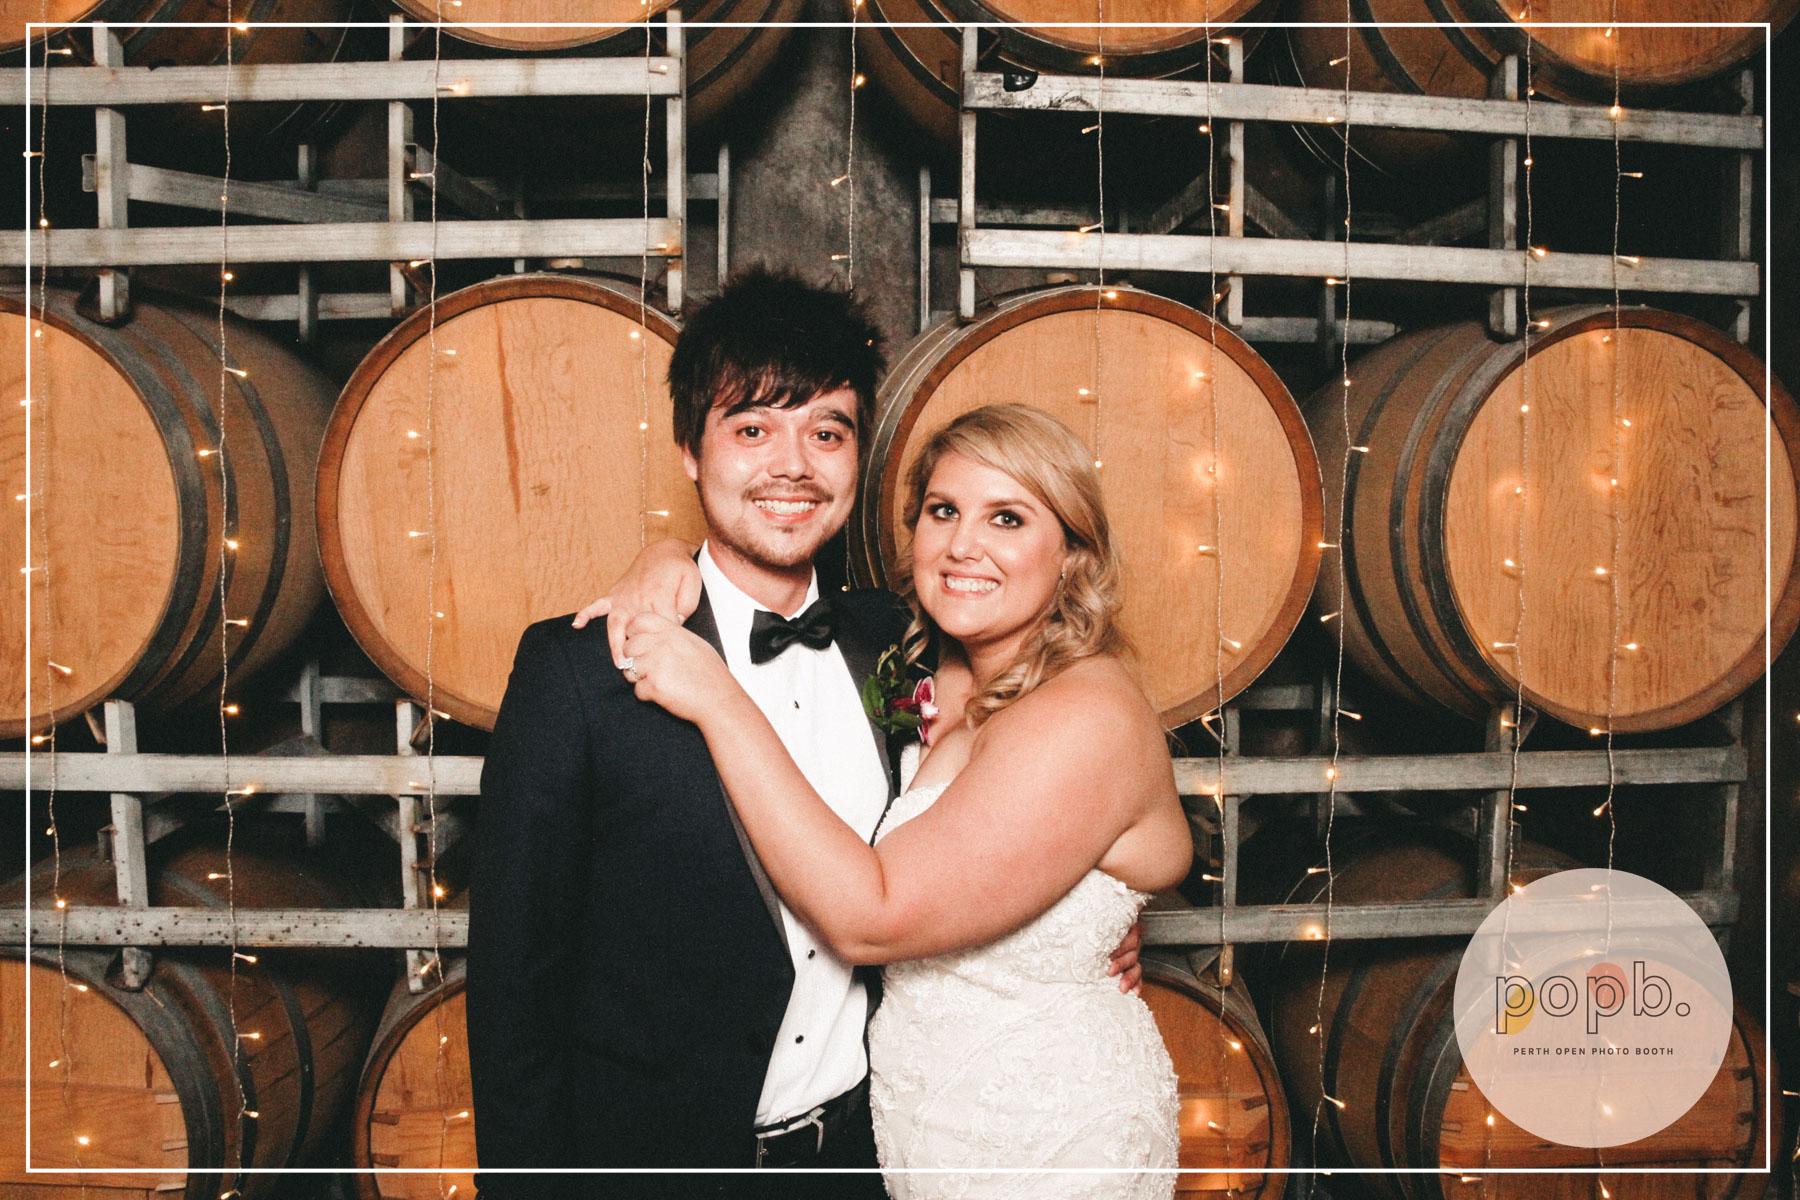 ashlee + adam's wedding - pASSWORD: PROVIDED ON THE night- ALL LOWERCASE -